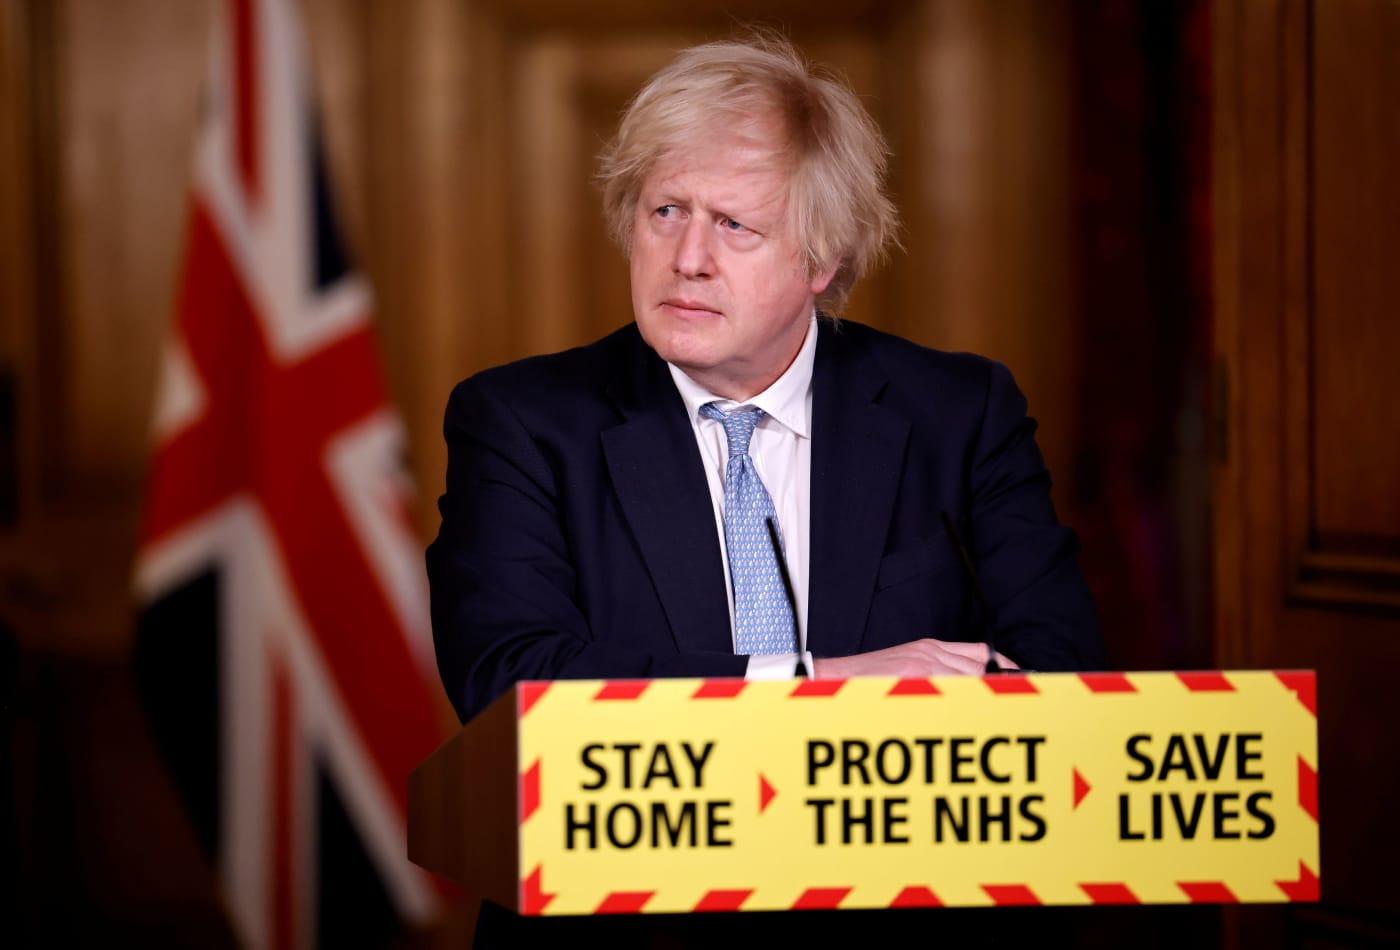 Hug with 'care and common sense,' Boris Johnson says as lockdown rules for England ease